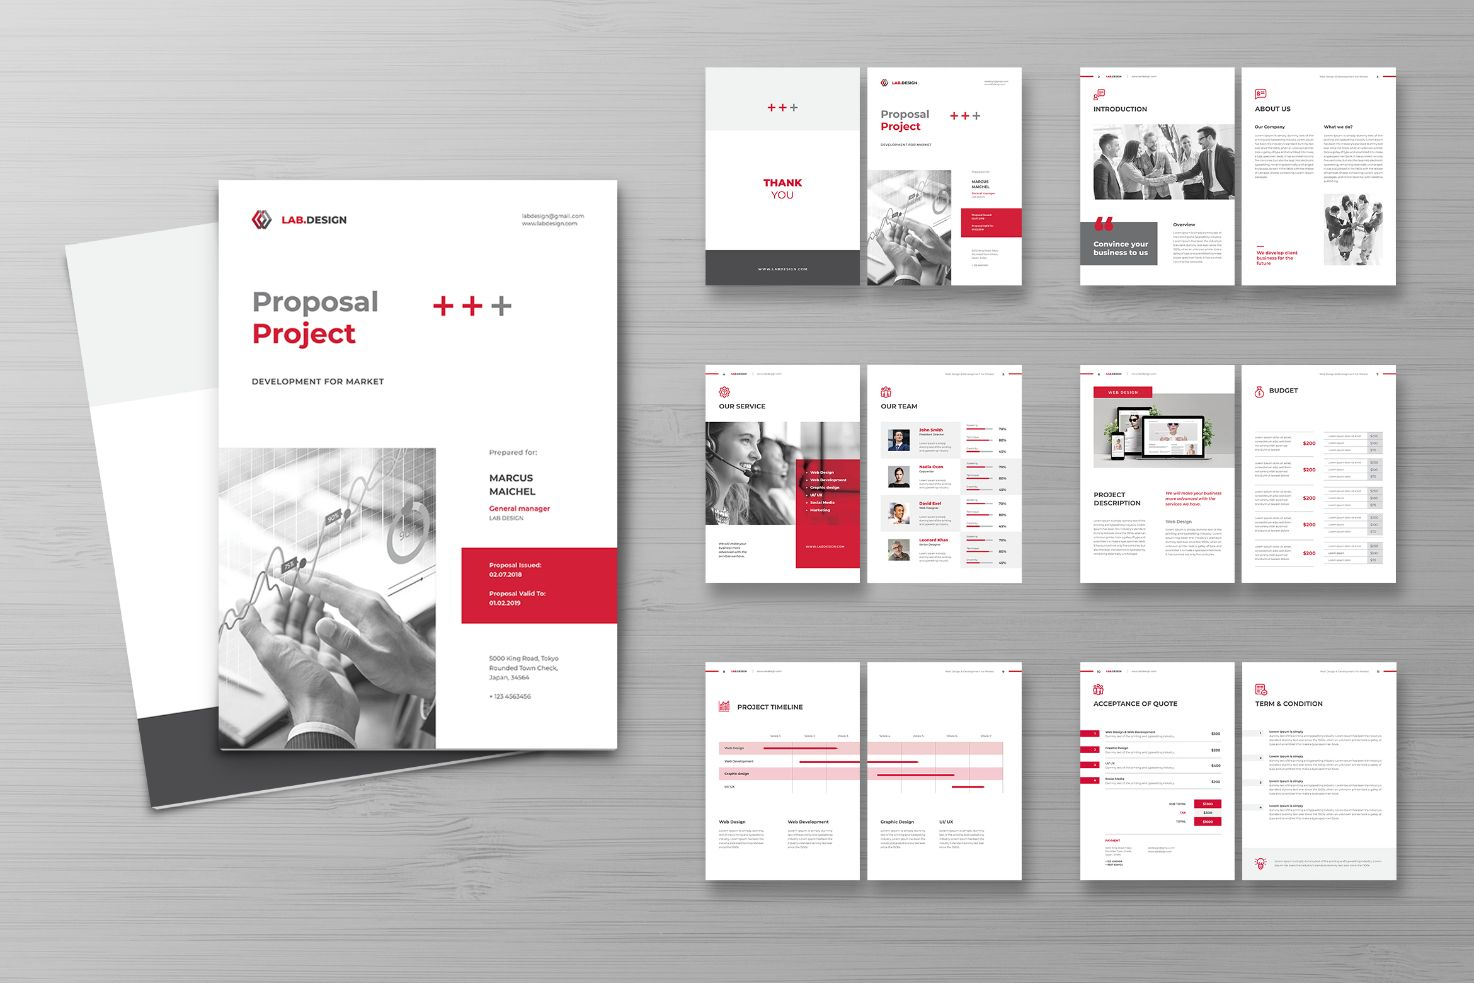 Proposal Digital Asset Service Corporate Identity Template